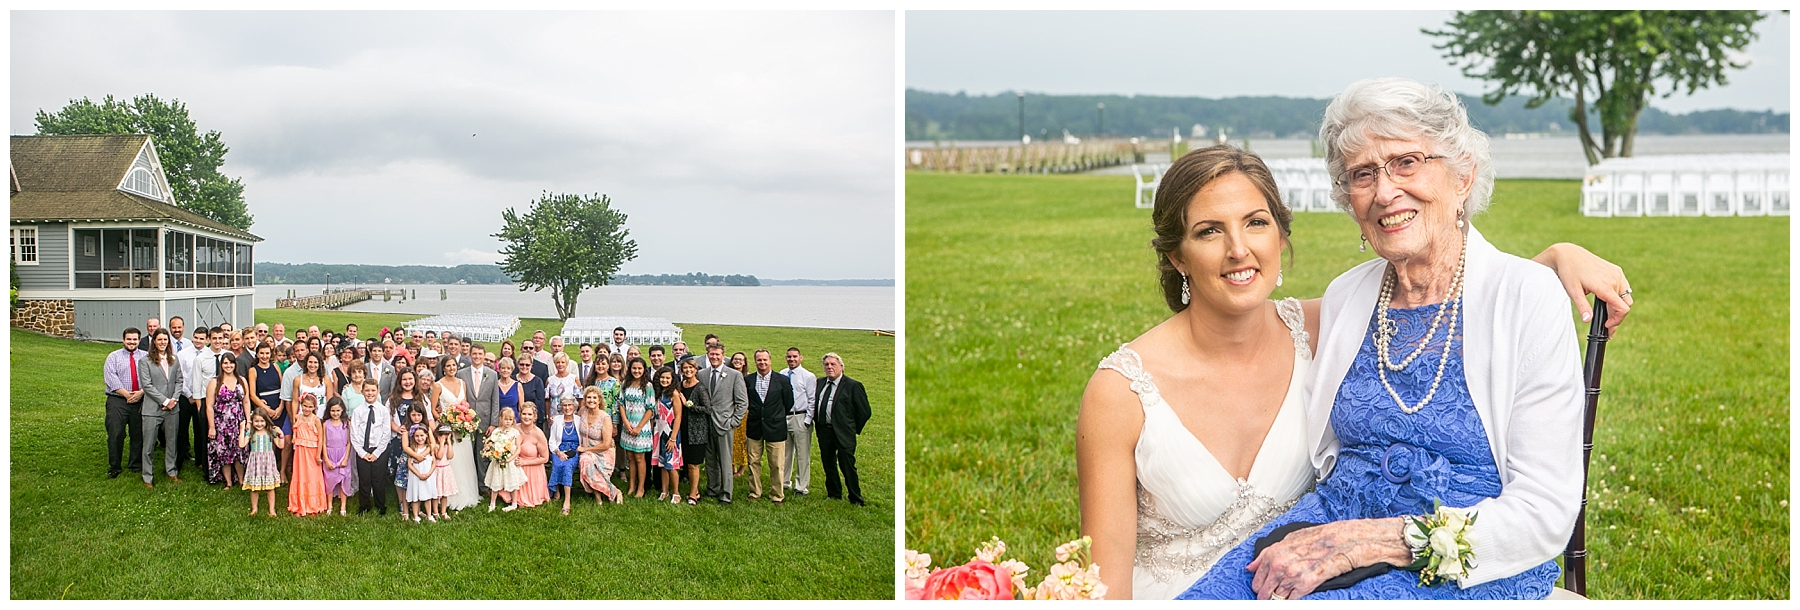 Chelsea Phil Bohemia River Overlook Wedding Living Radiant Photography photos_0117.jpg